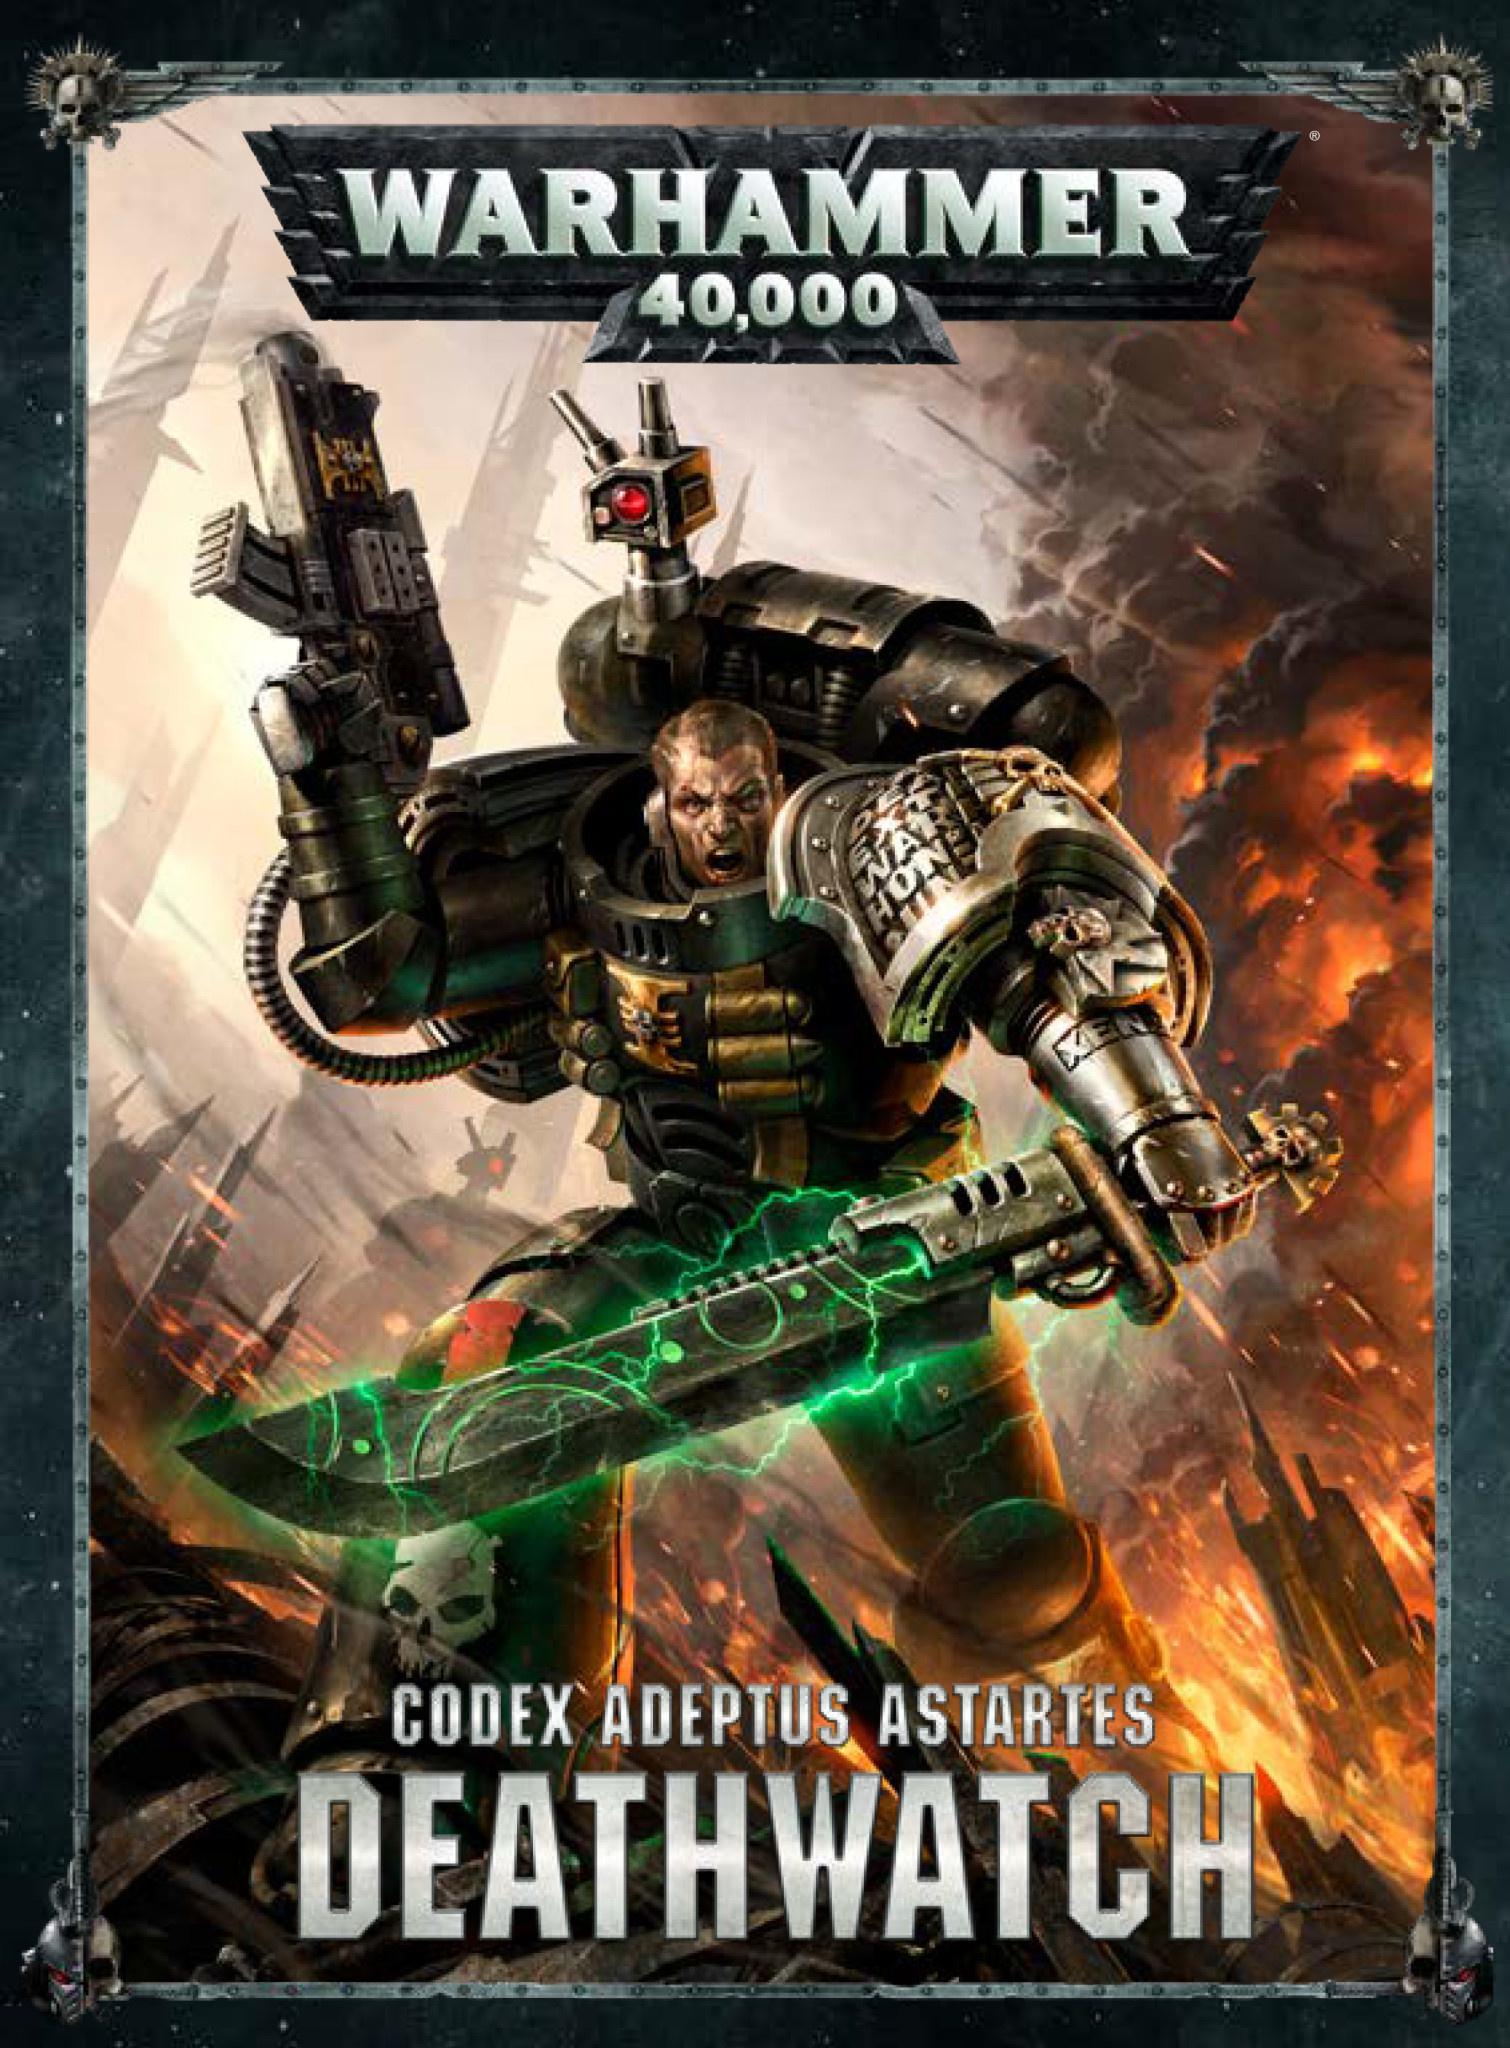 Warhammer 40k CODEX: DEATHWATCH (HARDBACK) (ENGLISH)